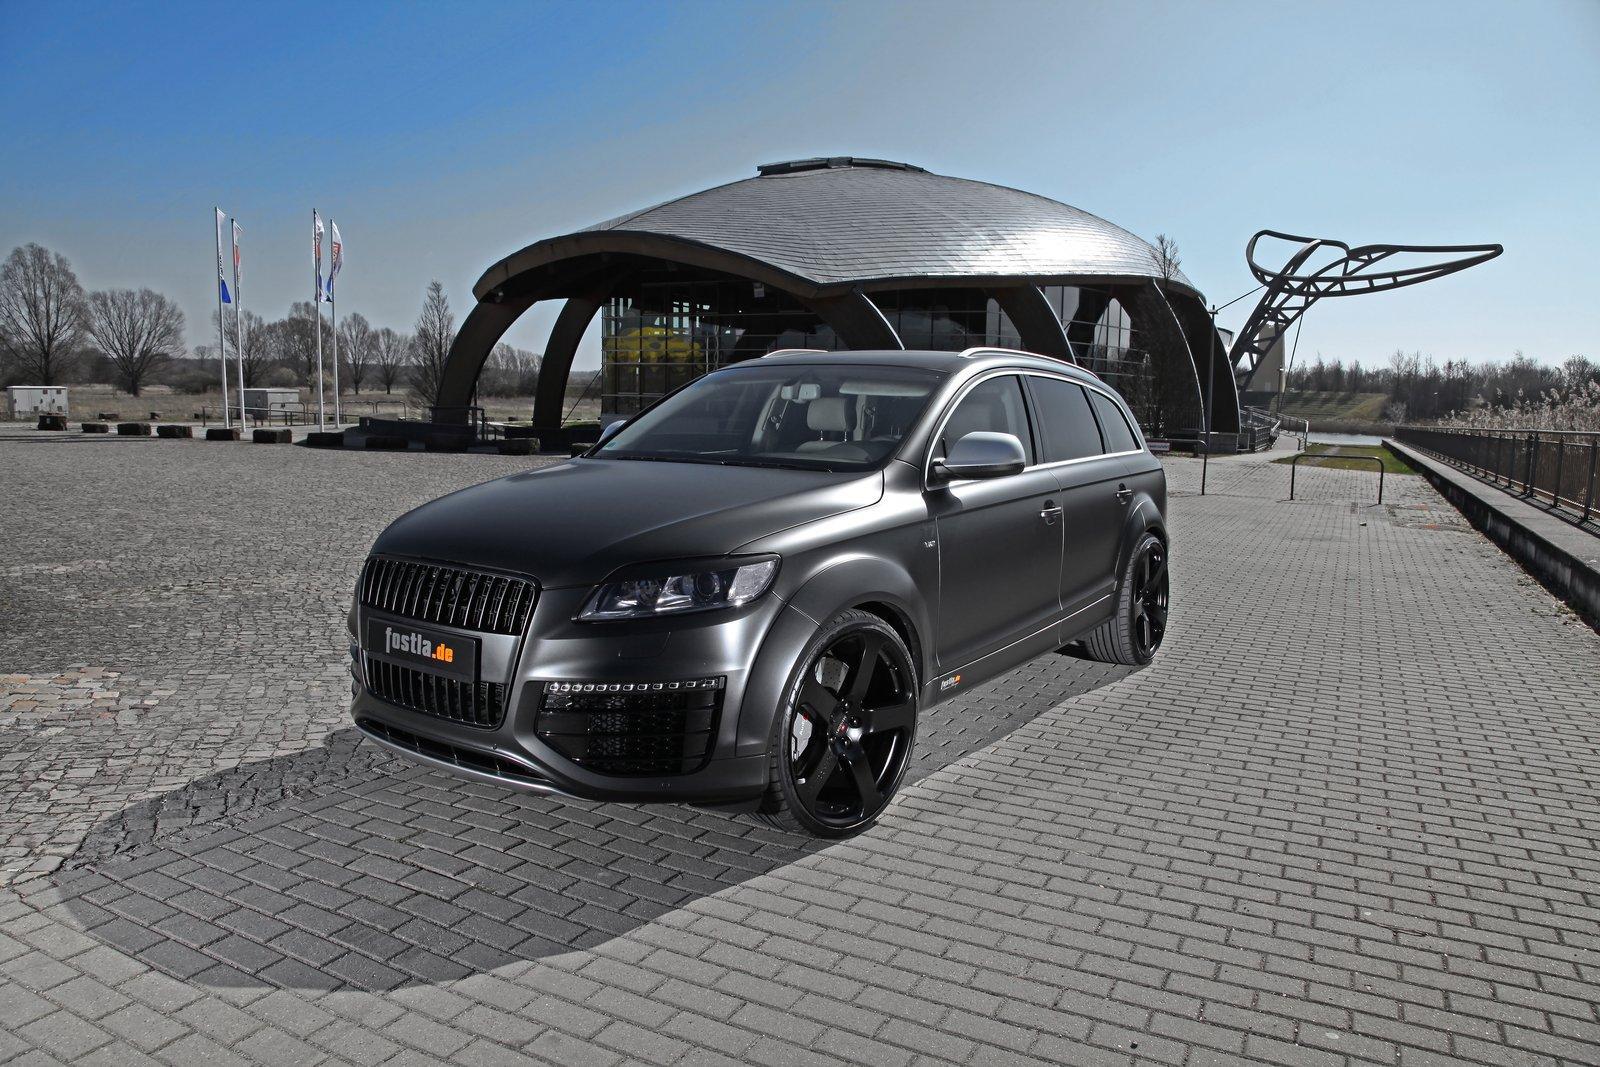 audi q7 v12 tdi by fostla car tuning styling. Black Bedroom Furniture Sets. Home Design Ideas